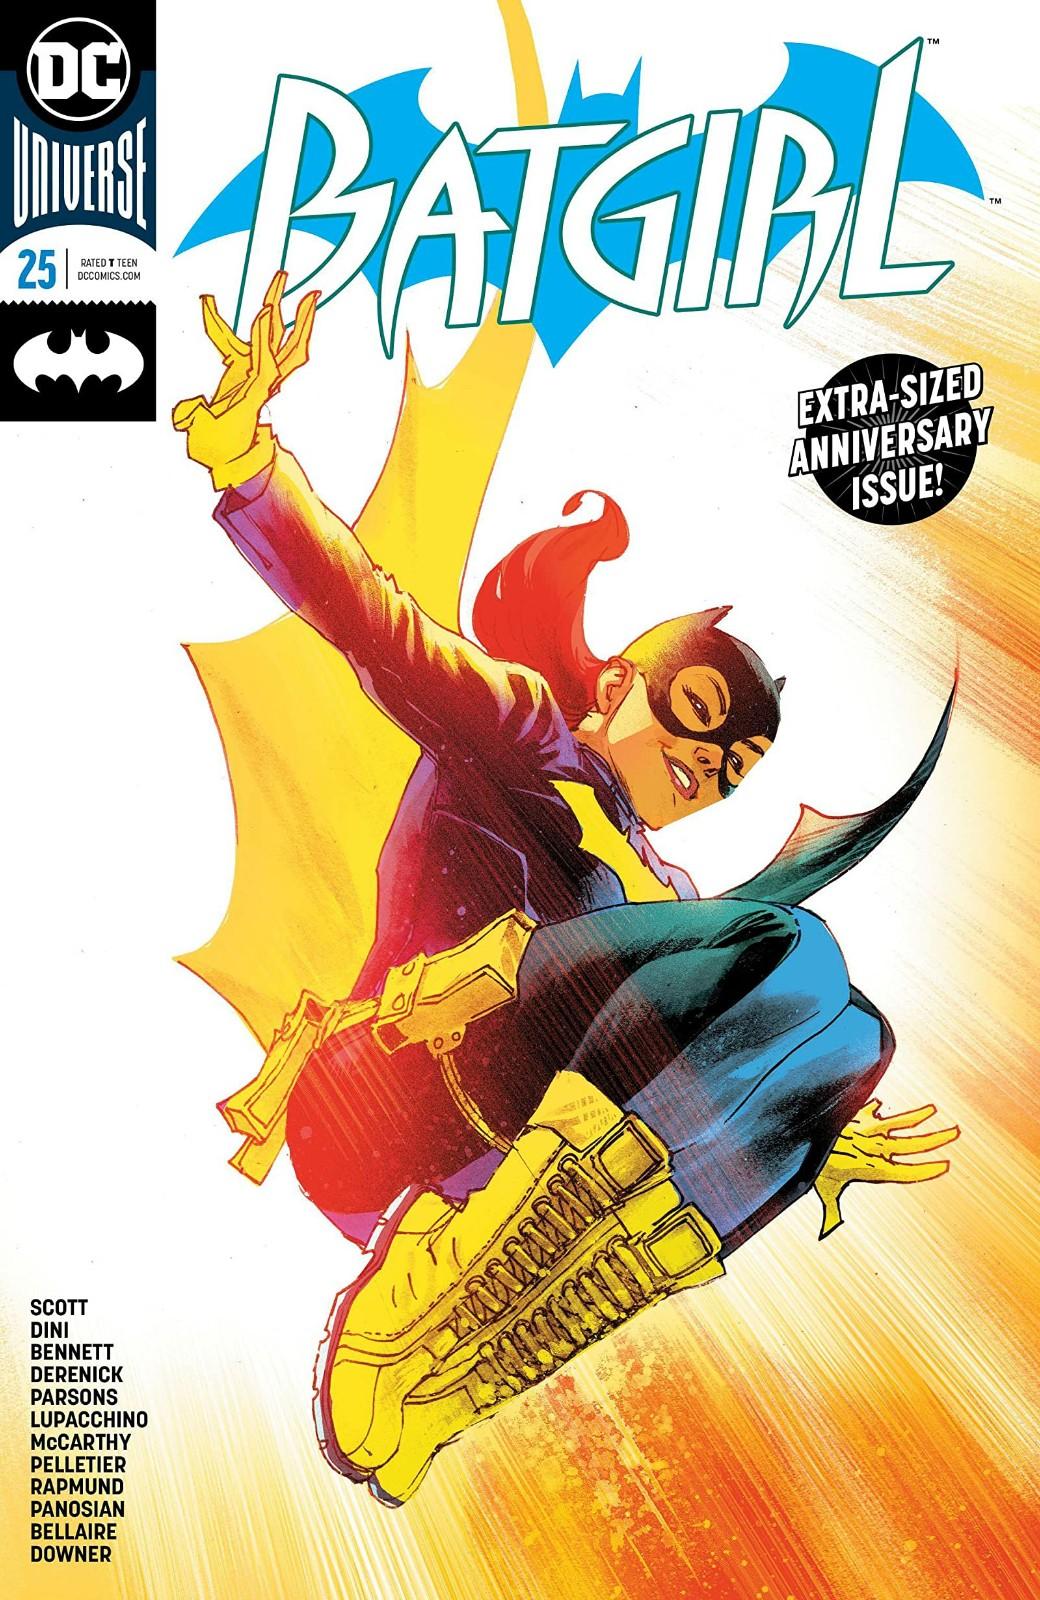 DC新片《蝙蝠少女》主演确定 拉丁裔美女演蝙蝠少女